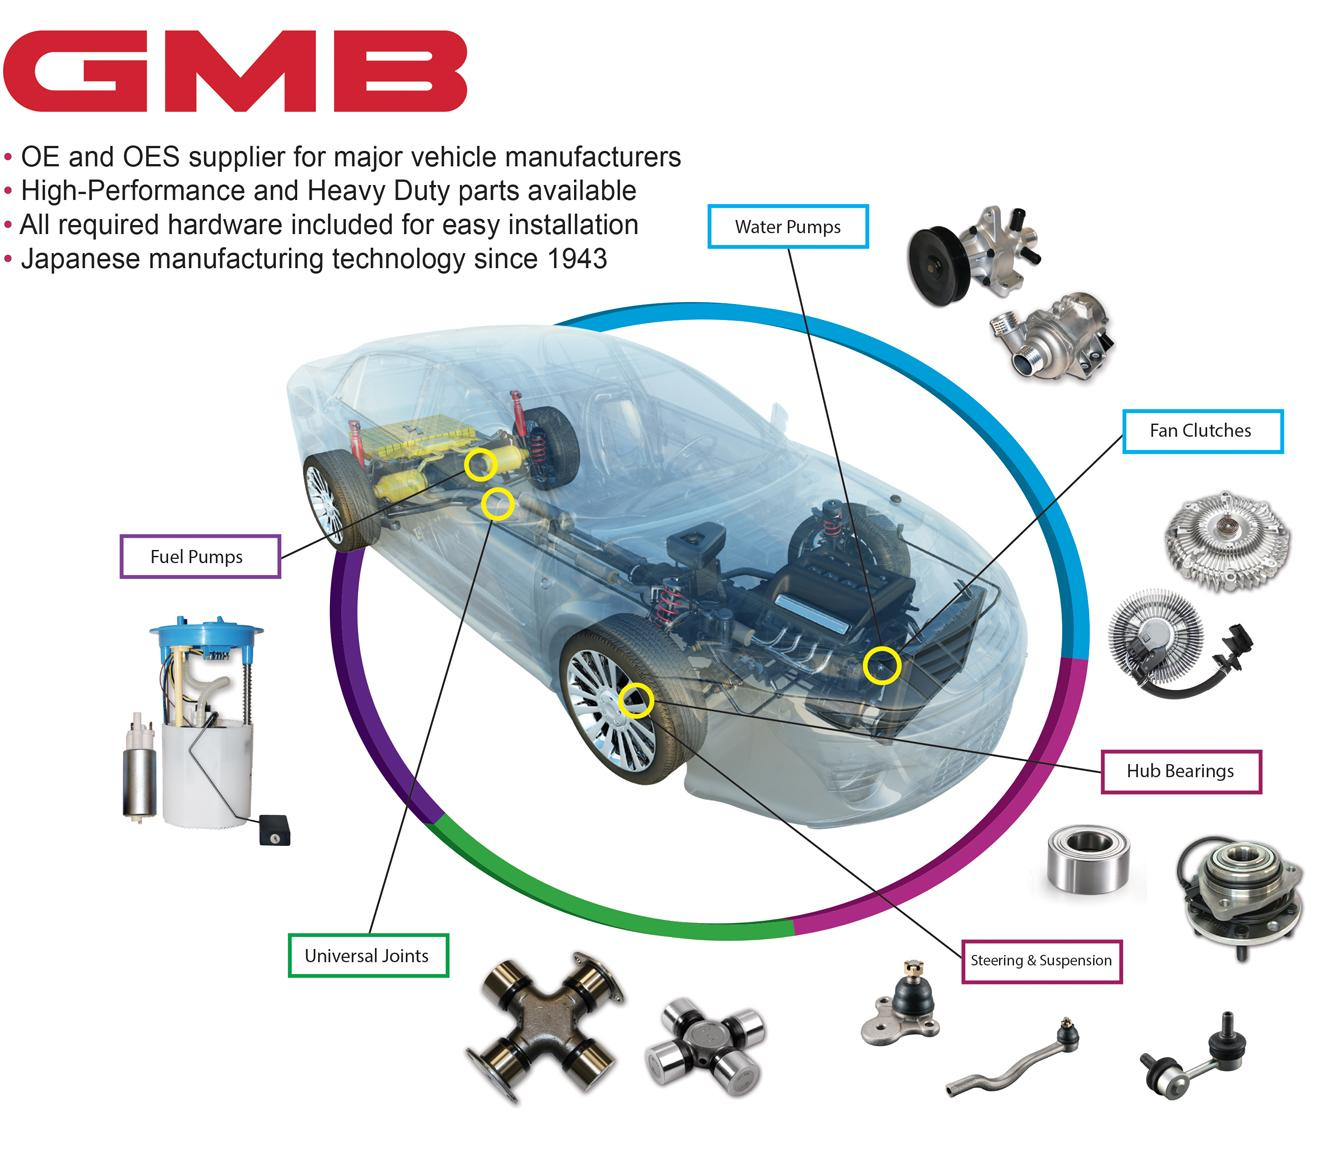 gmb 550 8040 mechanical fuel pump mechanical fuel pumps amazon canada rh amazon ca Fuel Pump Assembly Diagram Fuel Pump Assembly Diagram